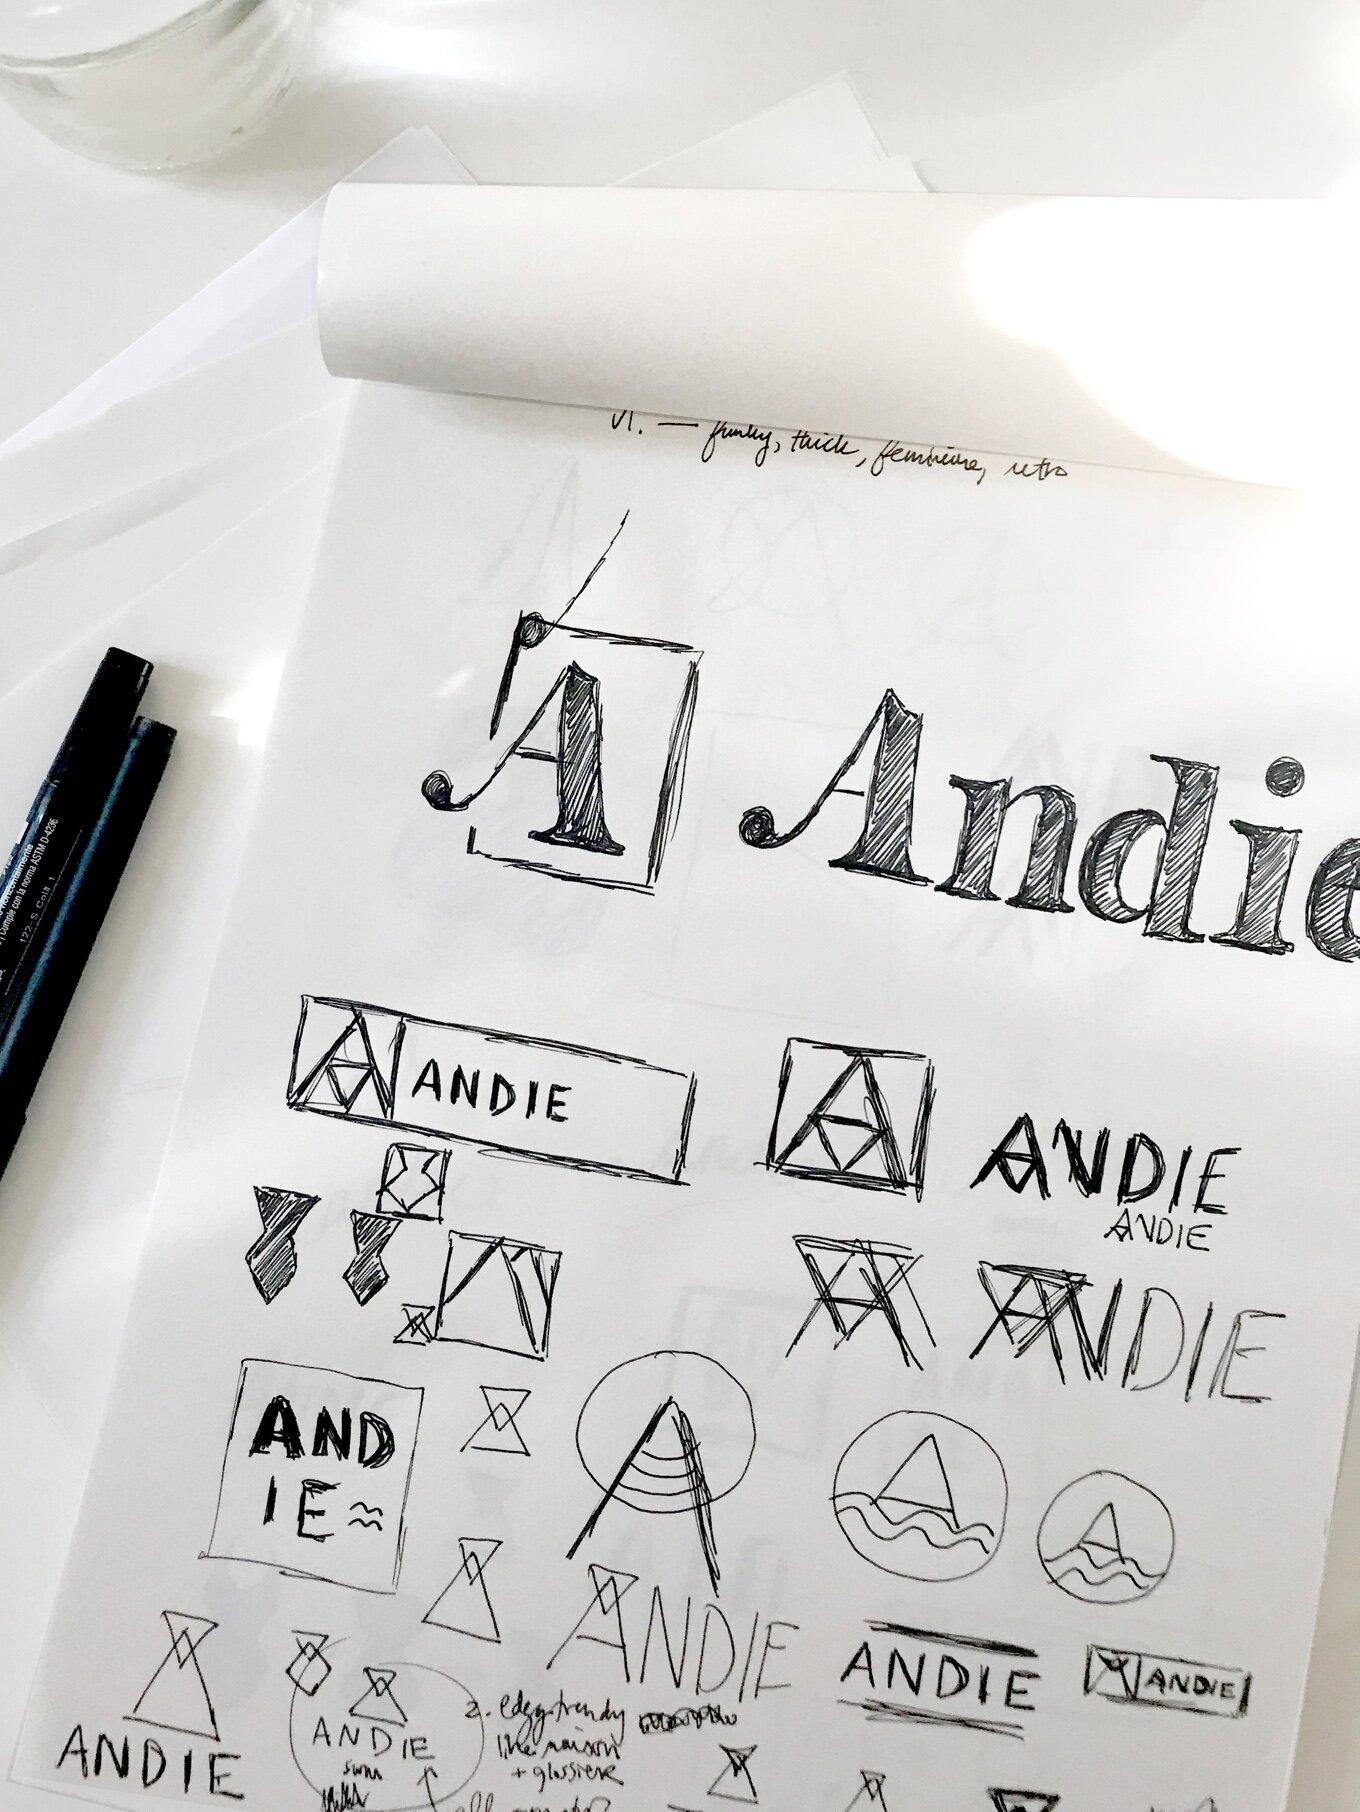 andie-swim-wildes-district-new-york-startup-branding-design-web-agency-4.jpg